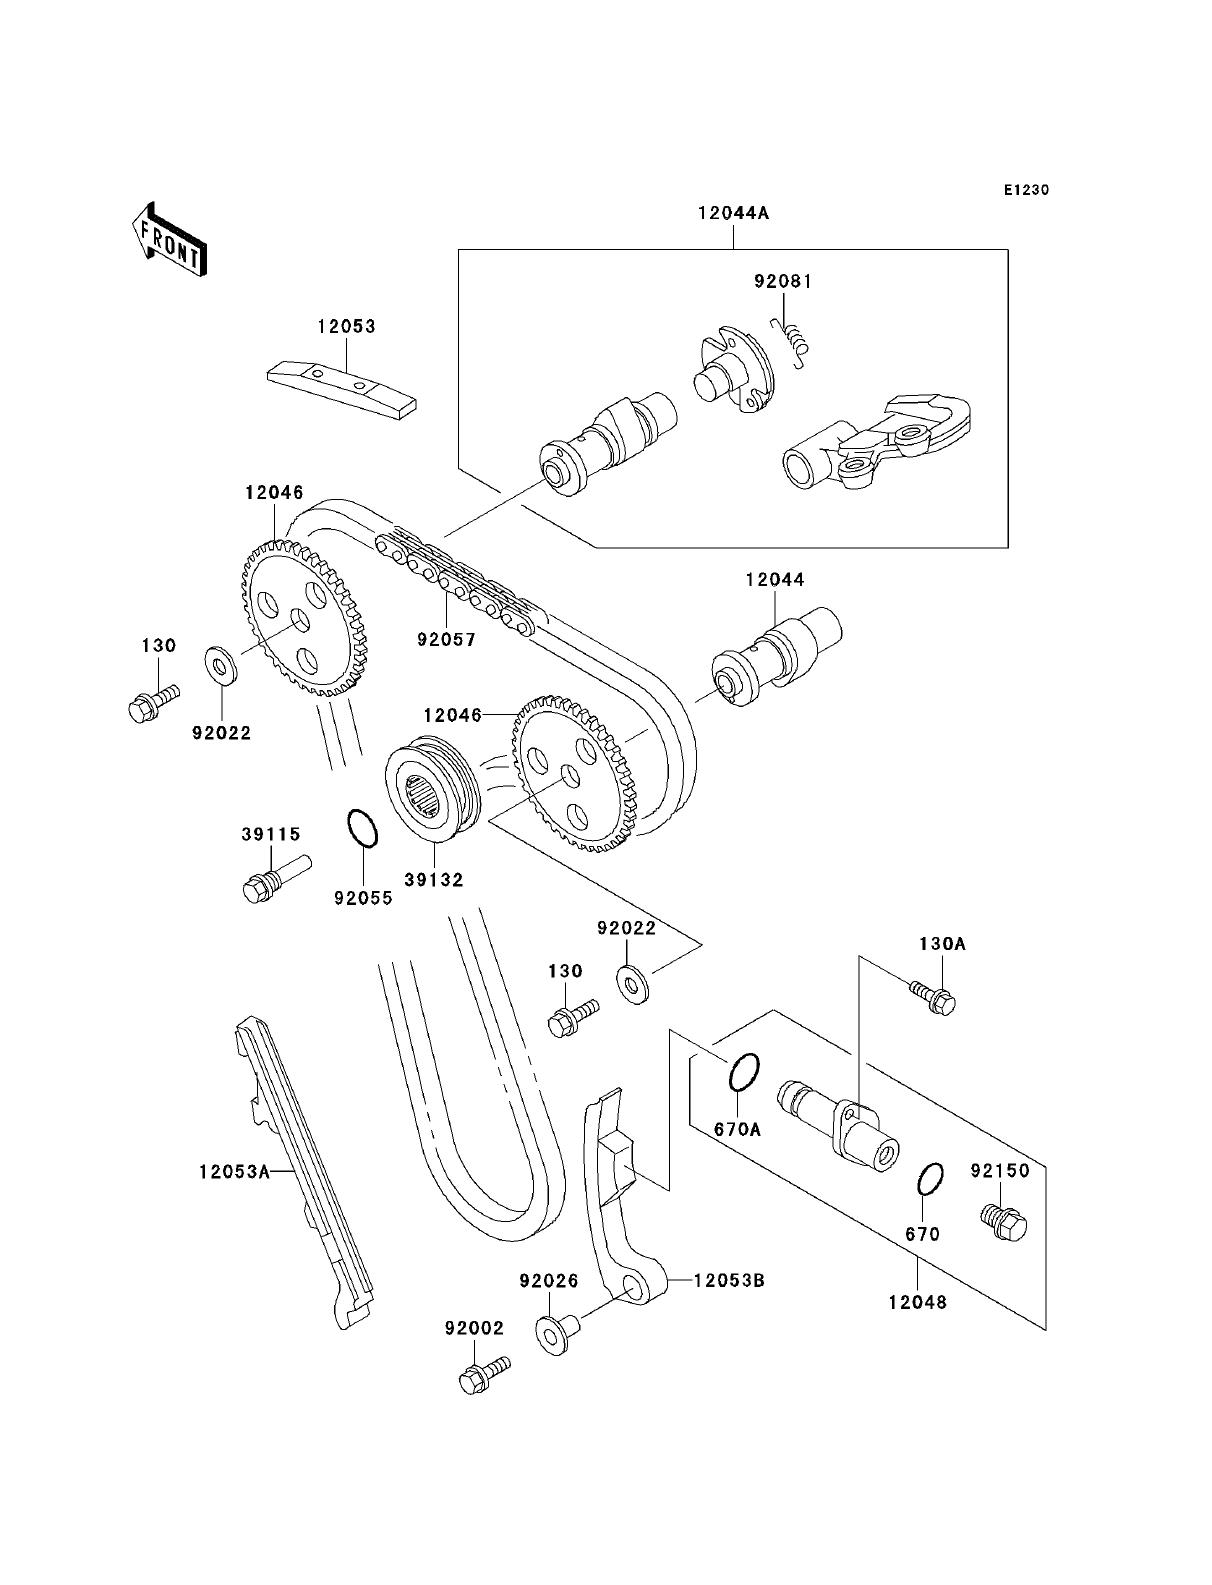 diagram wiring yfm400fwn 5 function led tailgate light bar yamaha ttr 225 auto